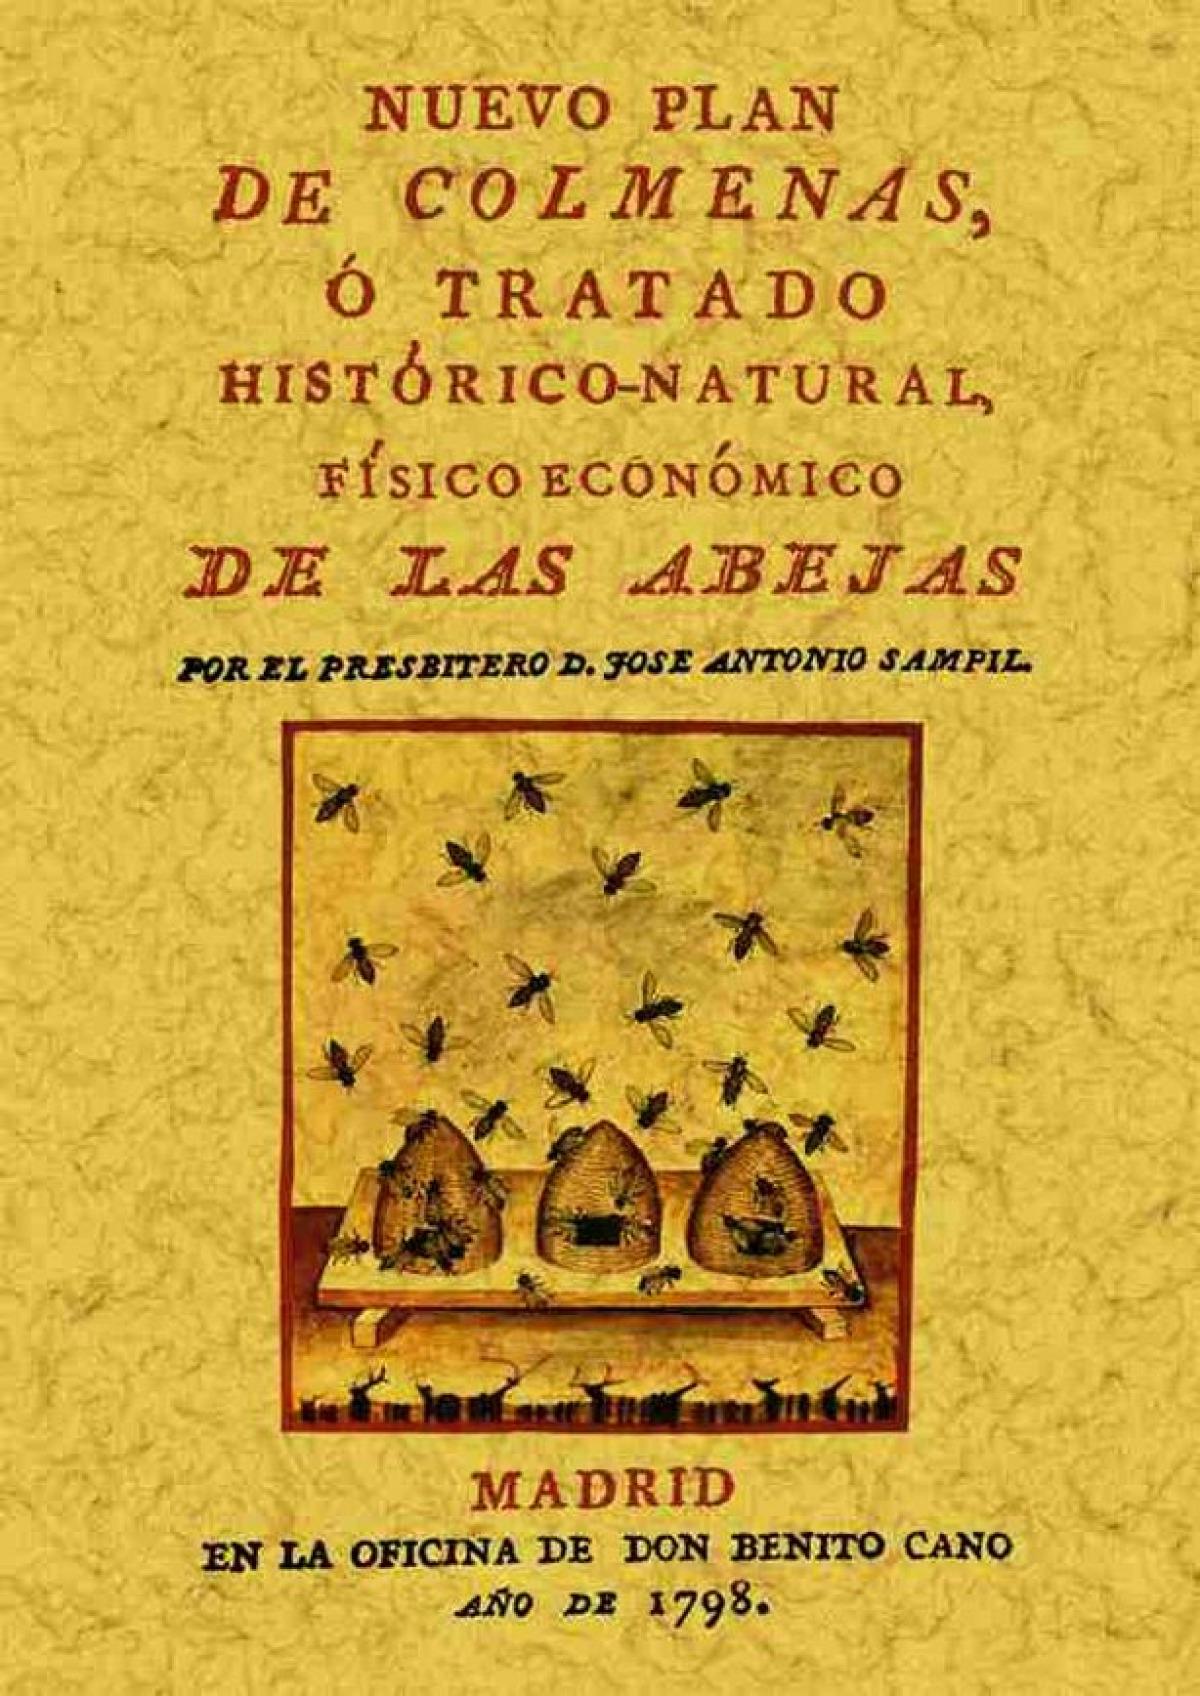 Nuevo plan de colmenas - Sampil, Jose Antonio